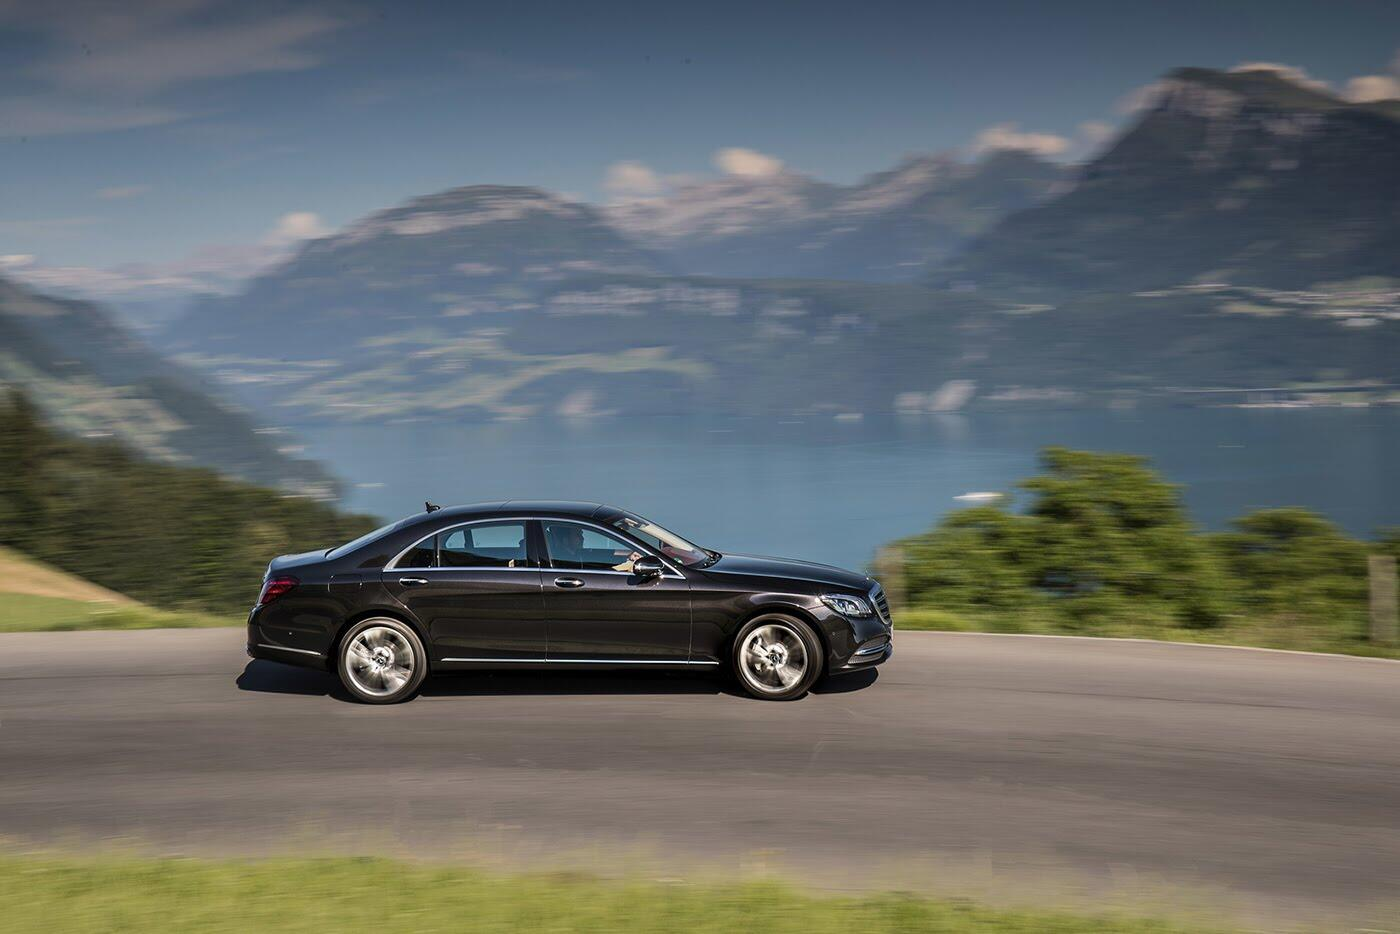 Ảnh chi tiết Mercedes-Benz S-Class 2018 - Hình 18